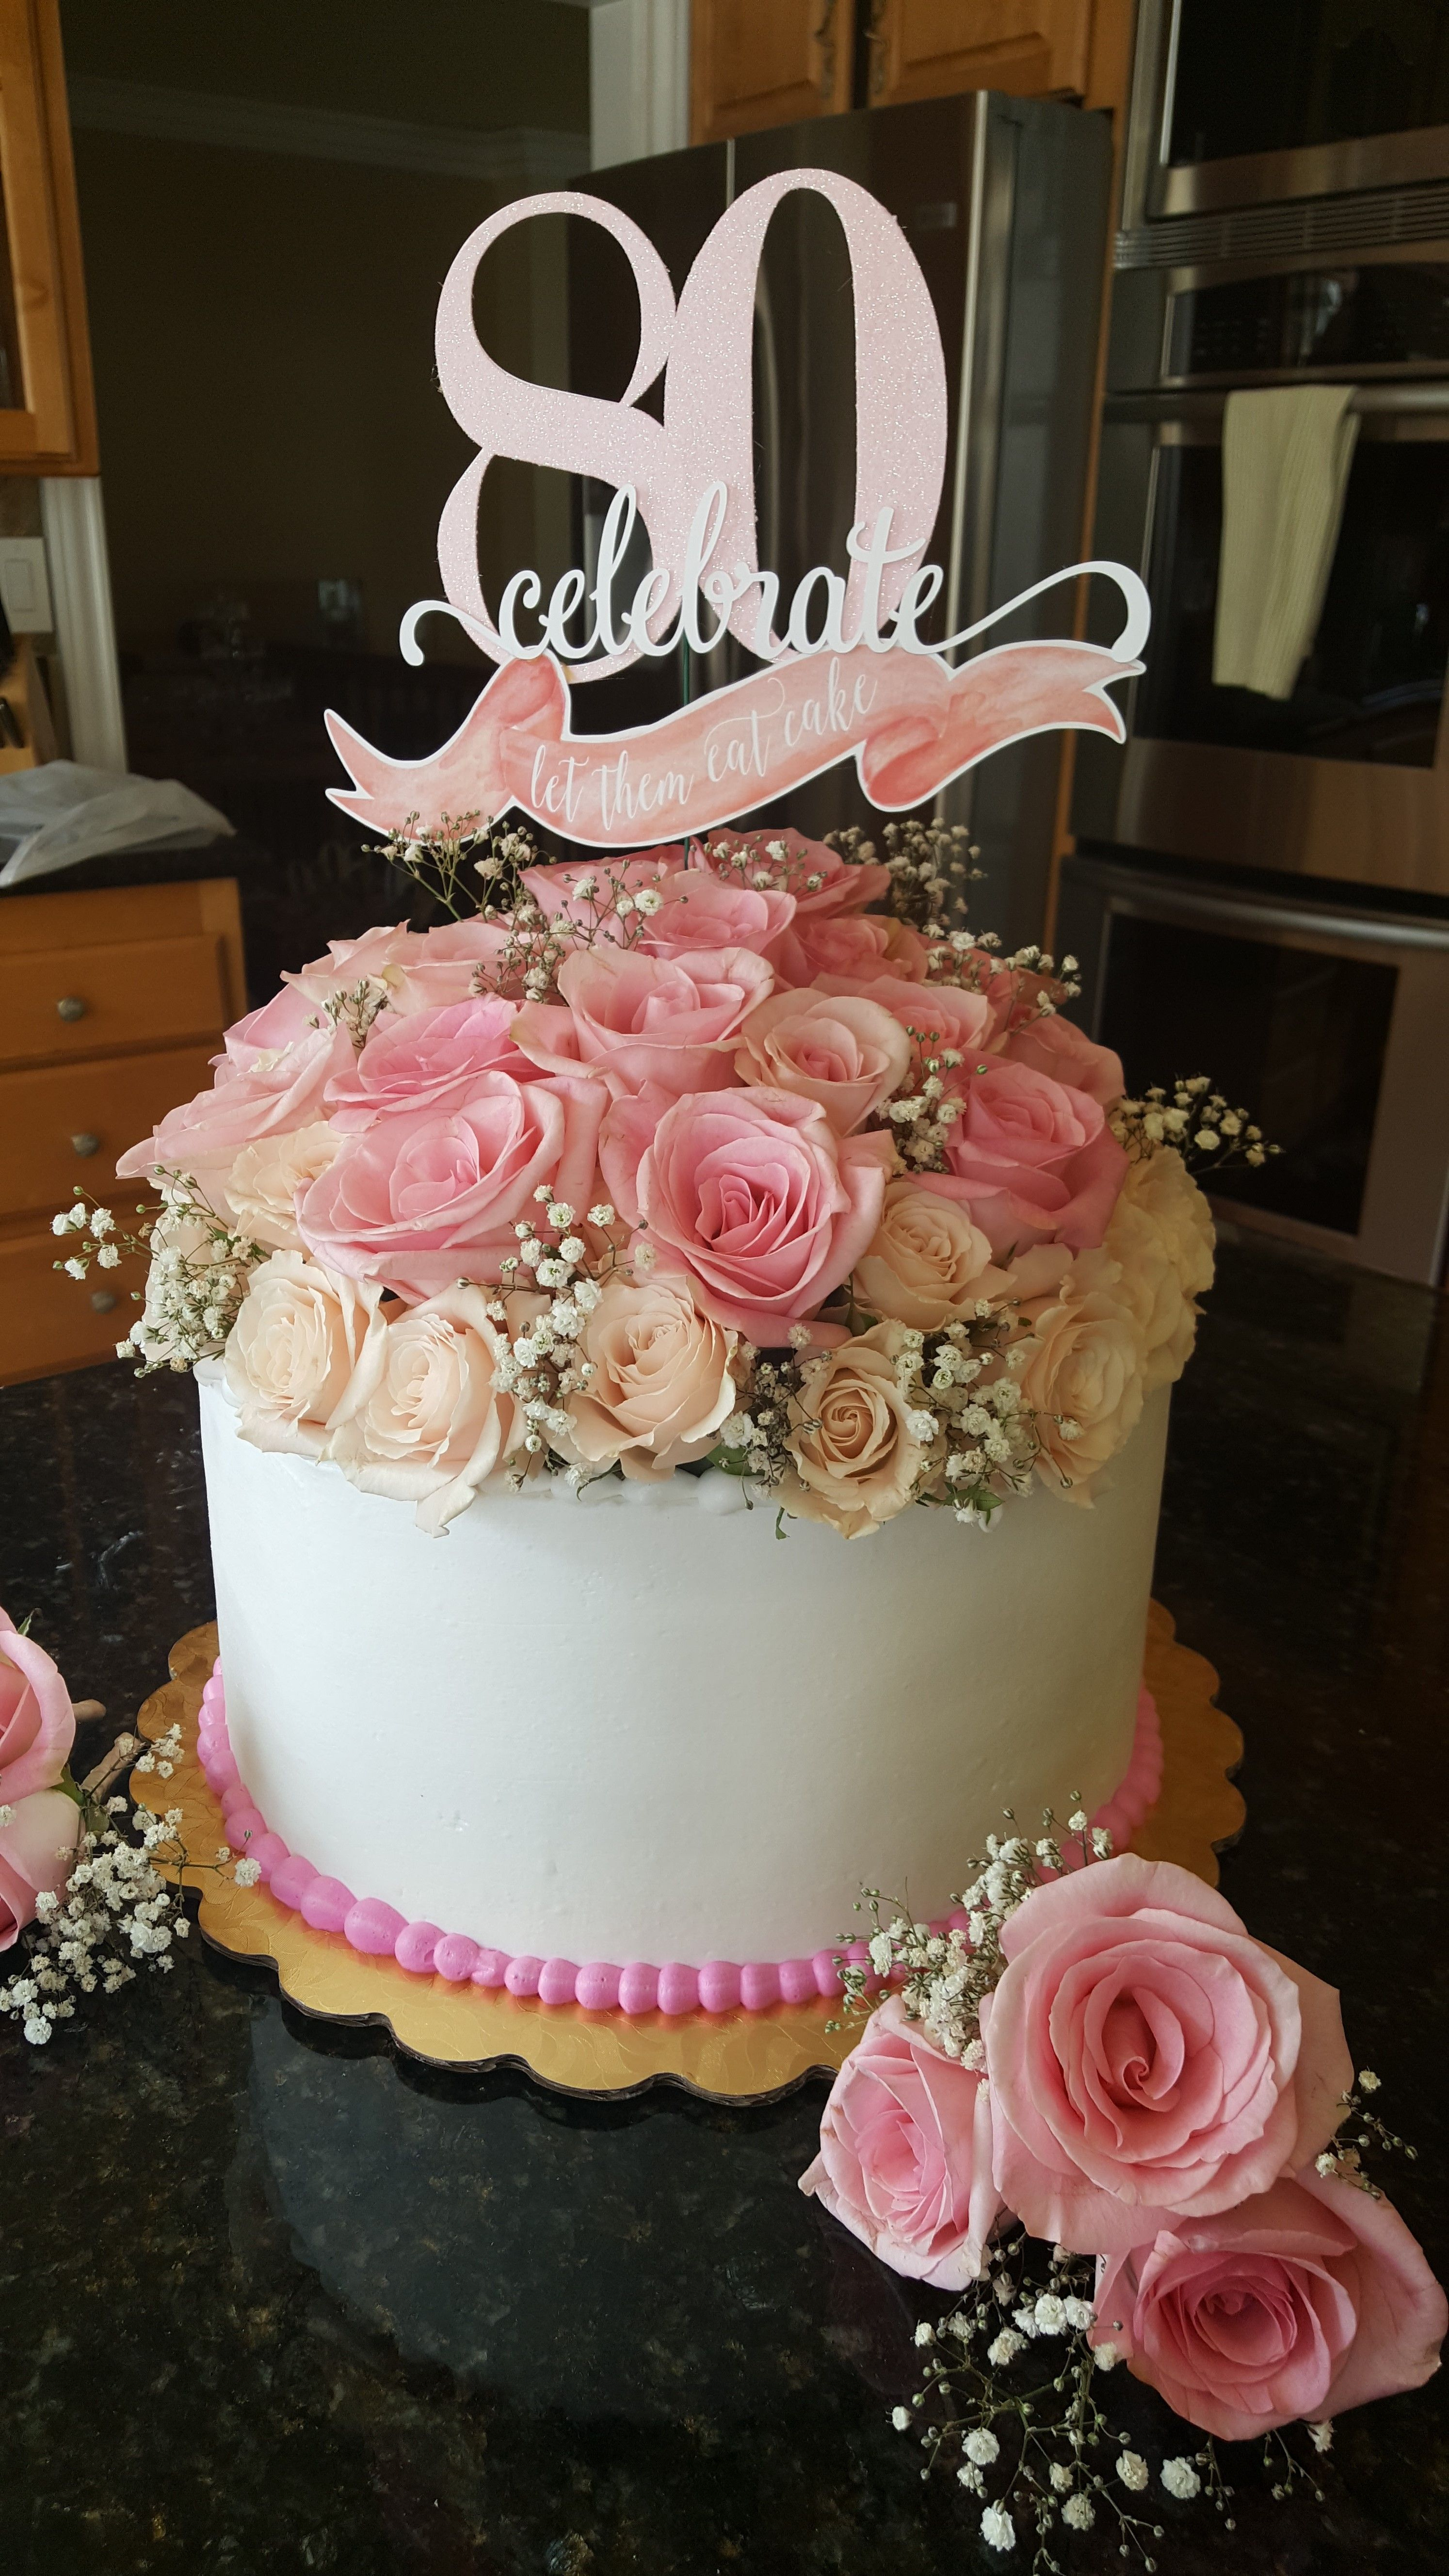 th birthday cake with fresh flower topper for grandma th cakes also best images rh pinterest